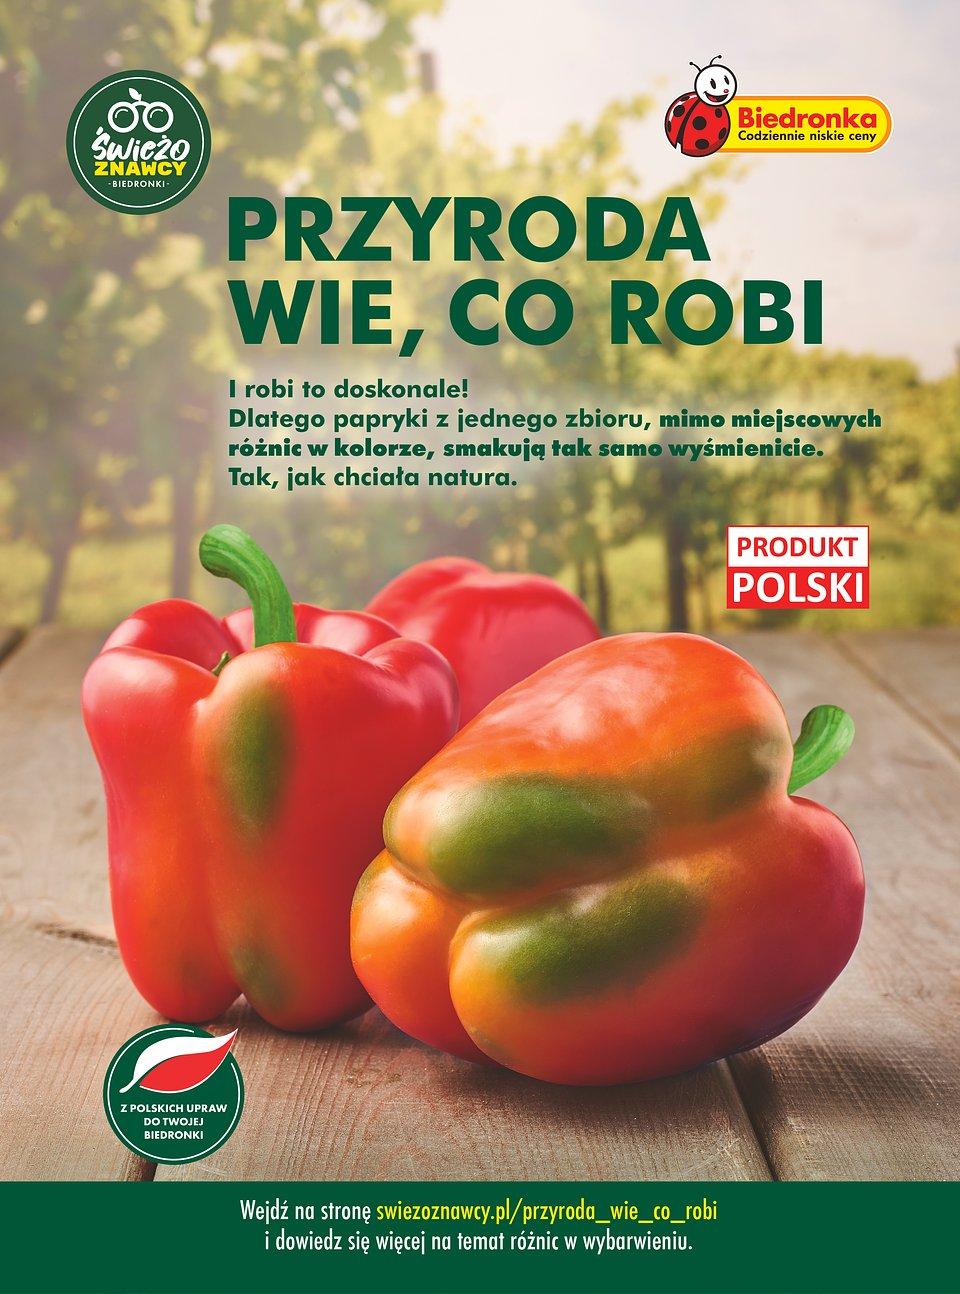 Biedronka_Papryka_1.tif